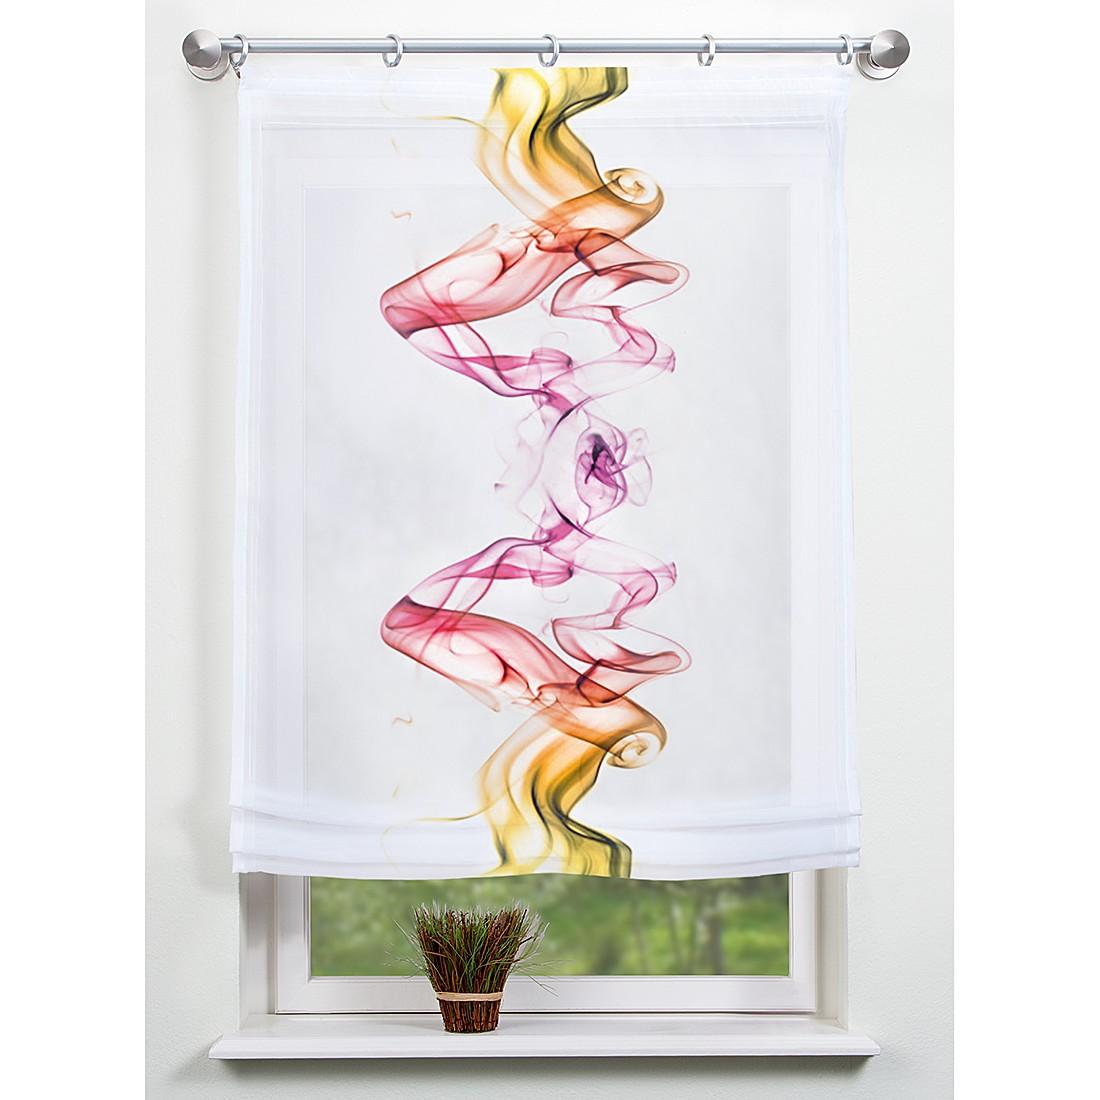 raffrollo chester multicolor 100 x 140 cm home wohnideen g nstig kaufen. Black Bedroom Furniture Sets. Home Design Ideas